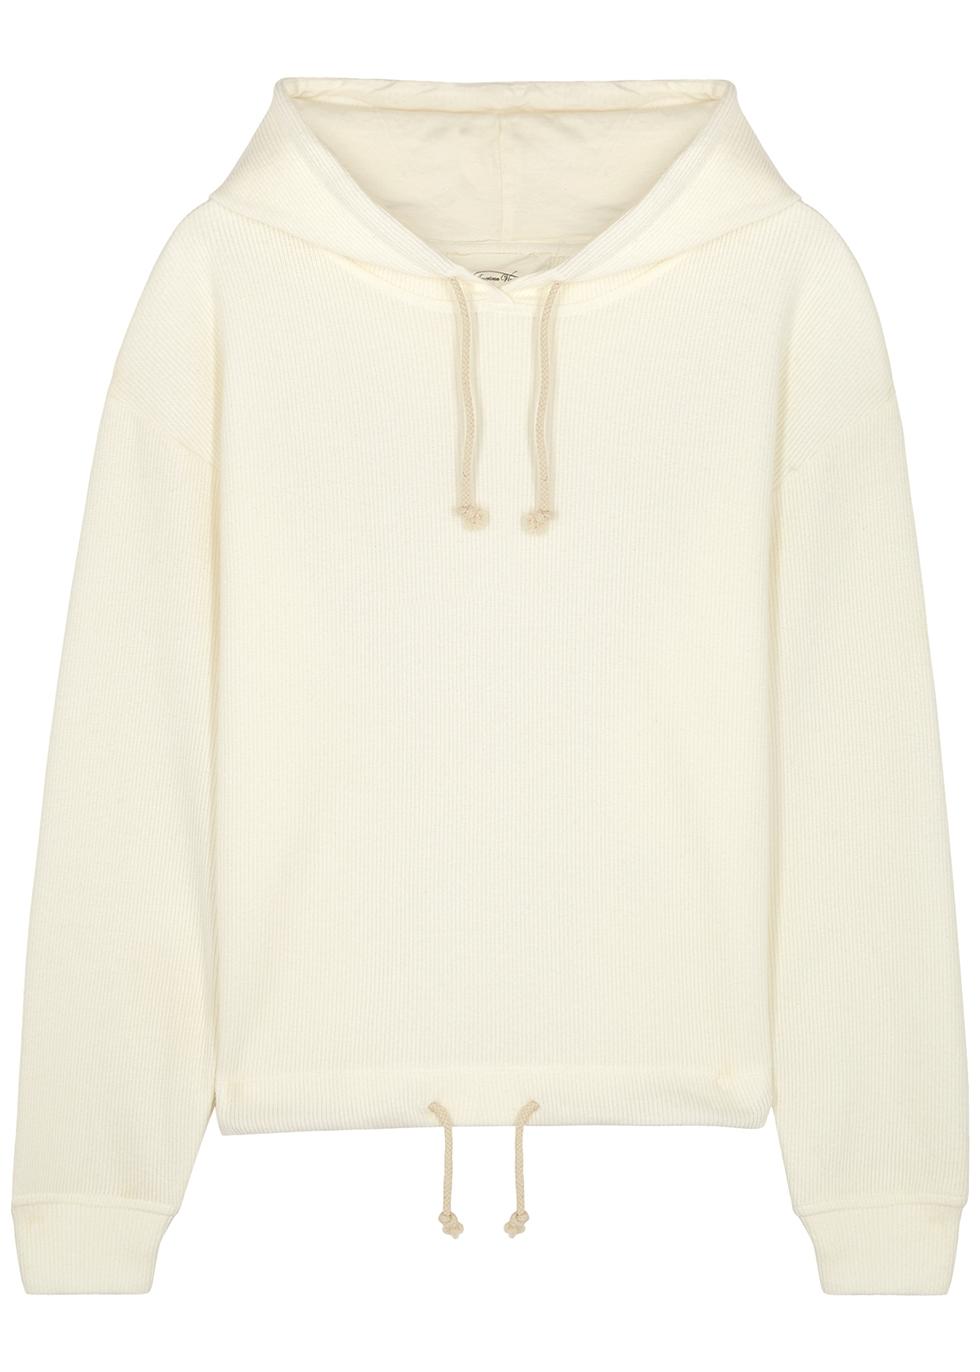 Pablito ribbed cotton-blend sweatshirt